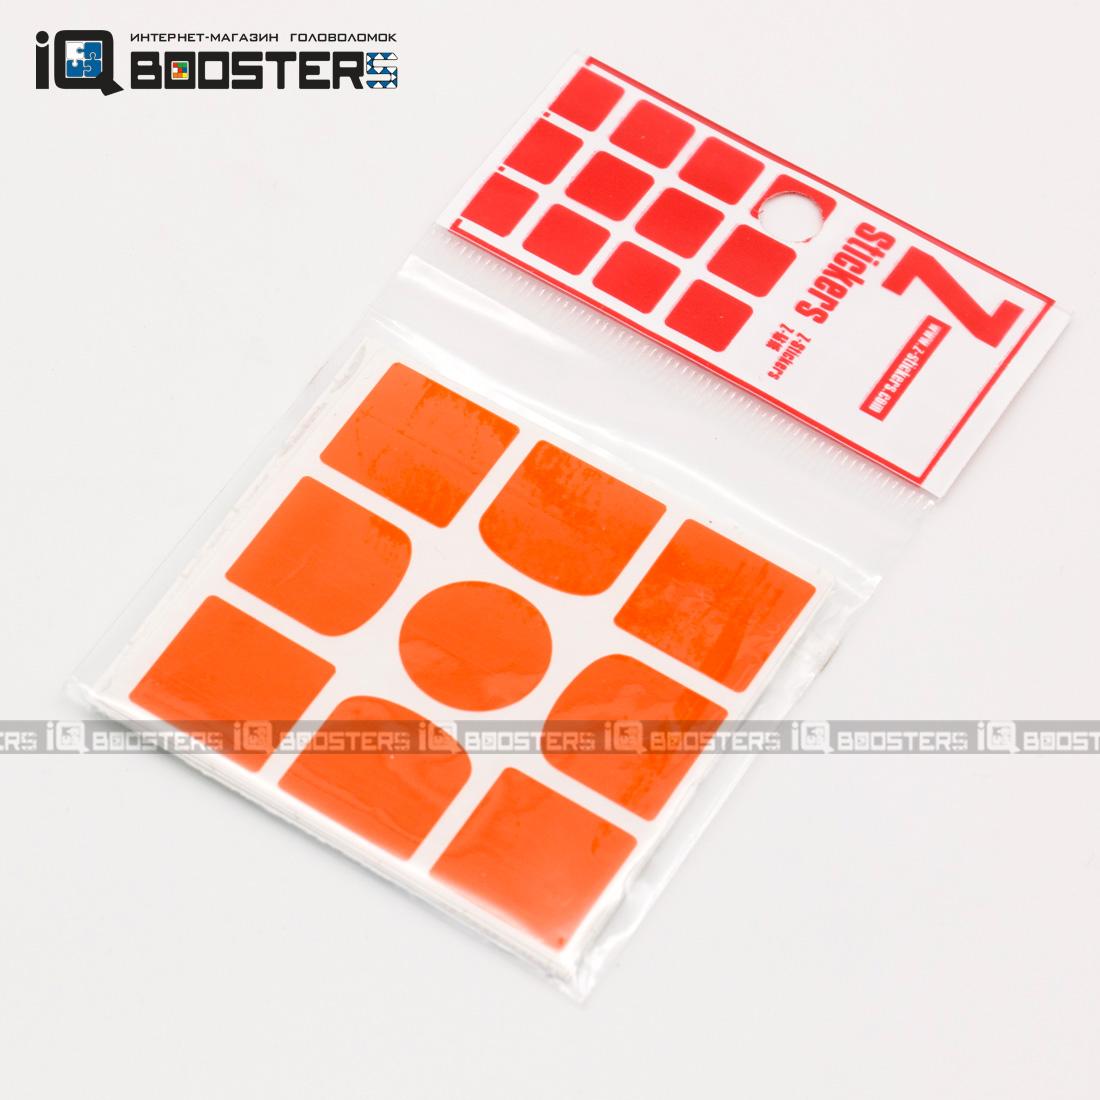 z-stickers_gan356_ff_hb_2